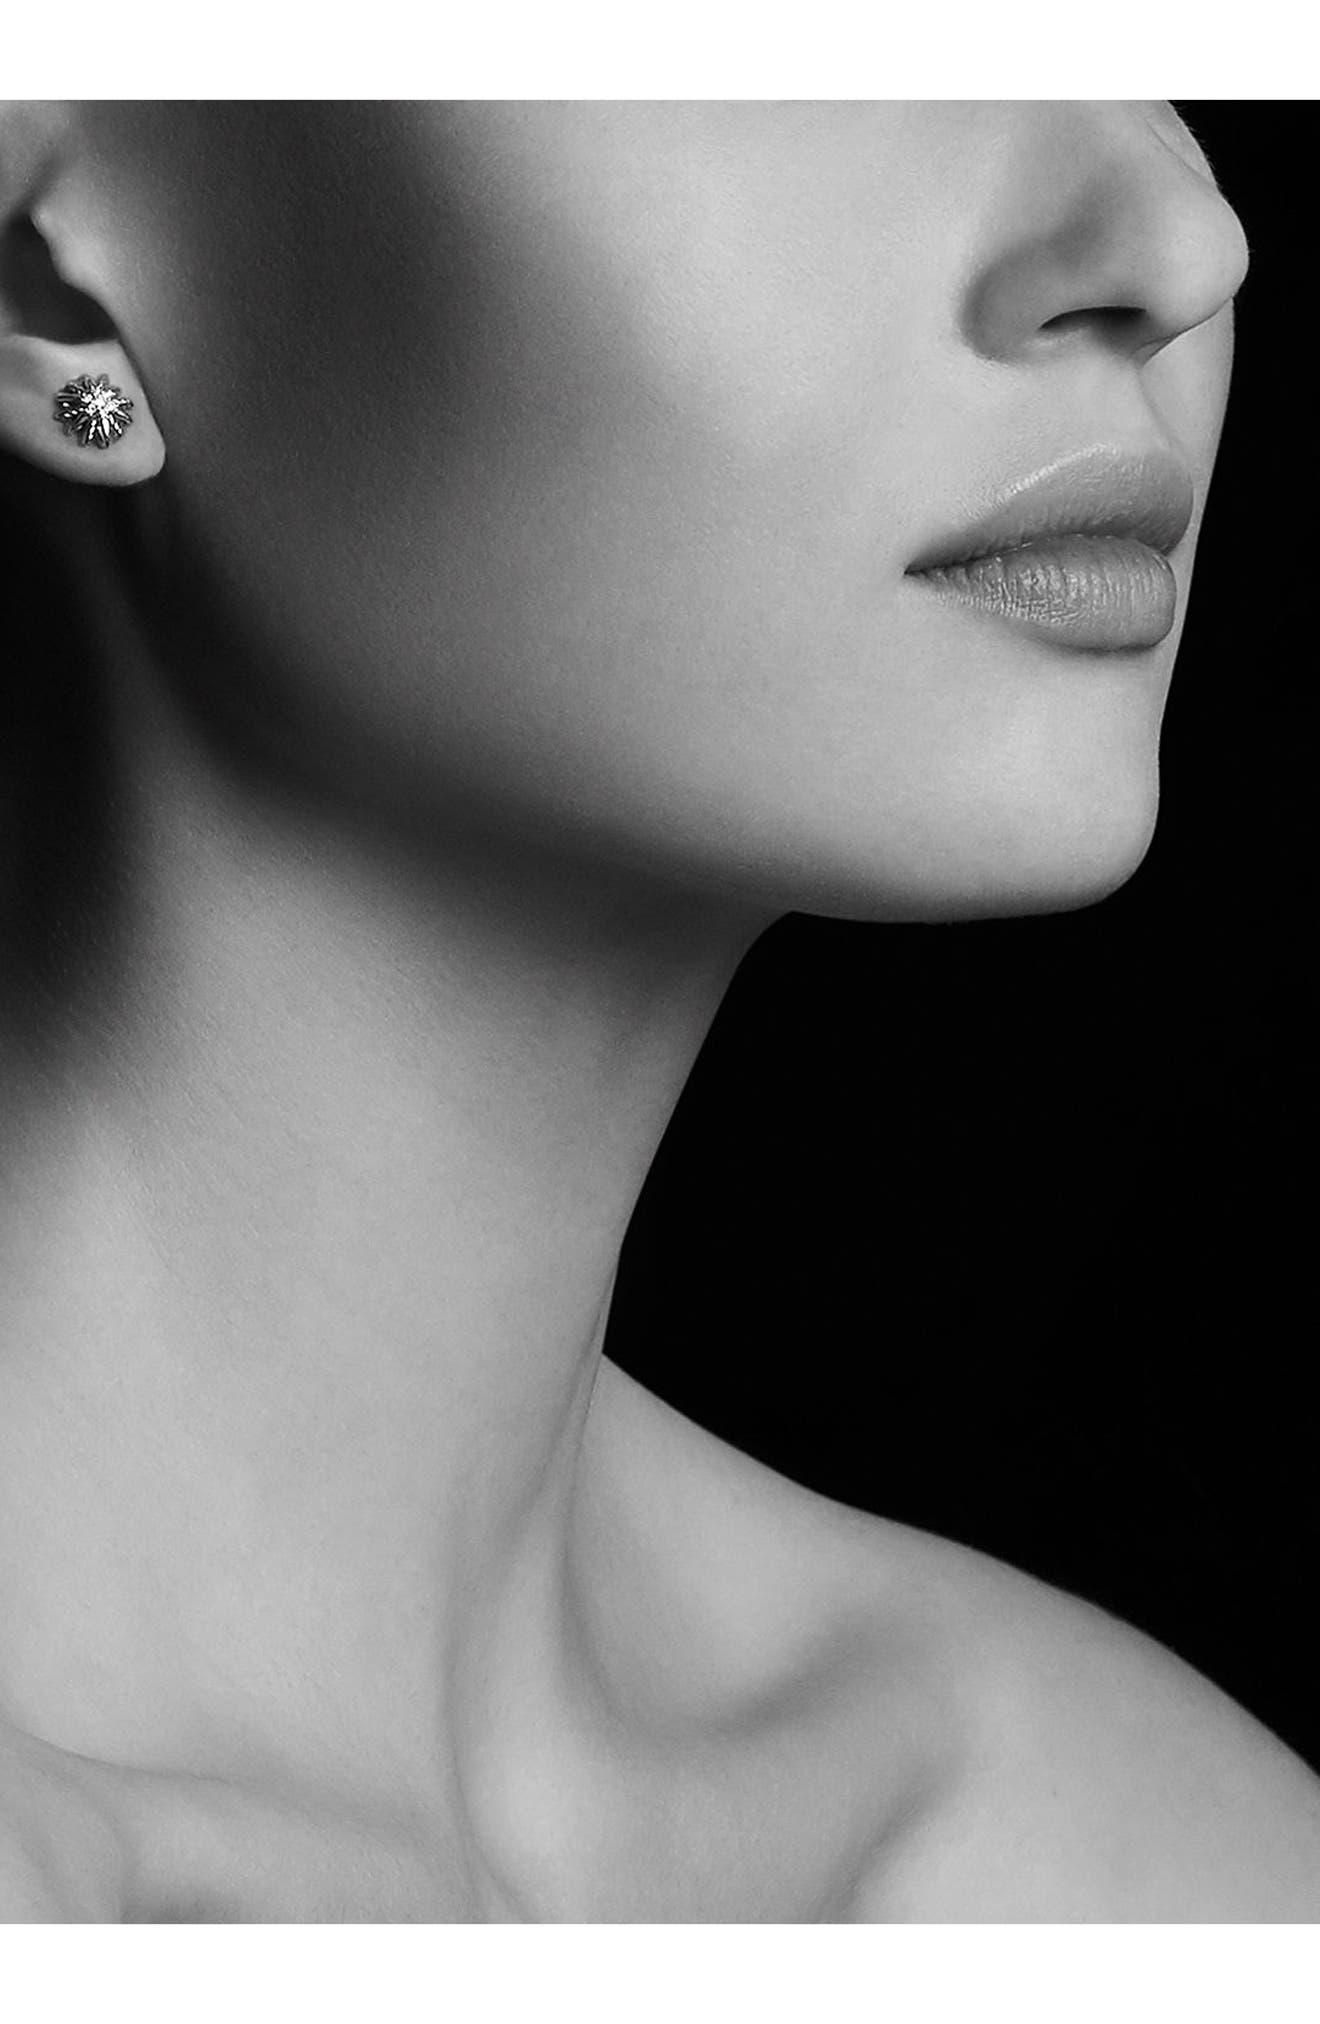 DAVID YURMAN,                             'Starburst' Earrings with Diamonds,                             Alternate thumbnail 2, color,                             DIAMOND